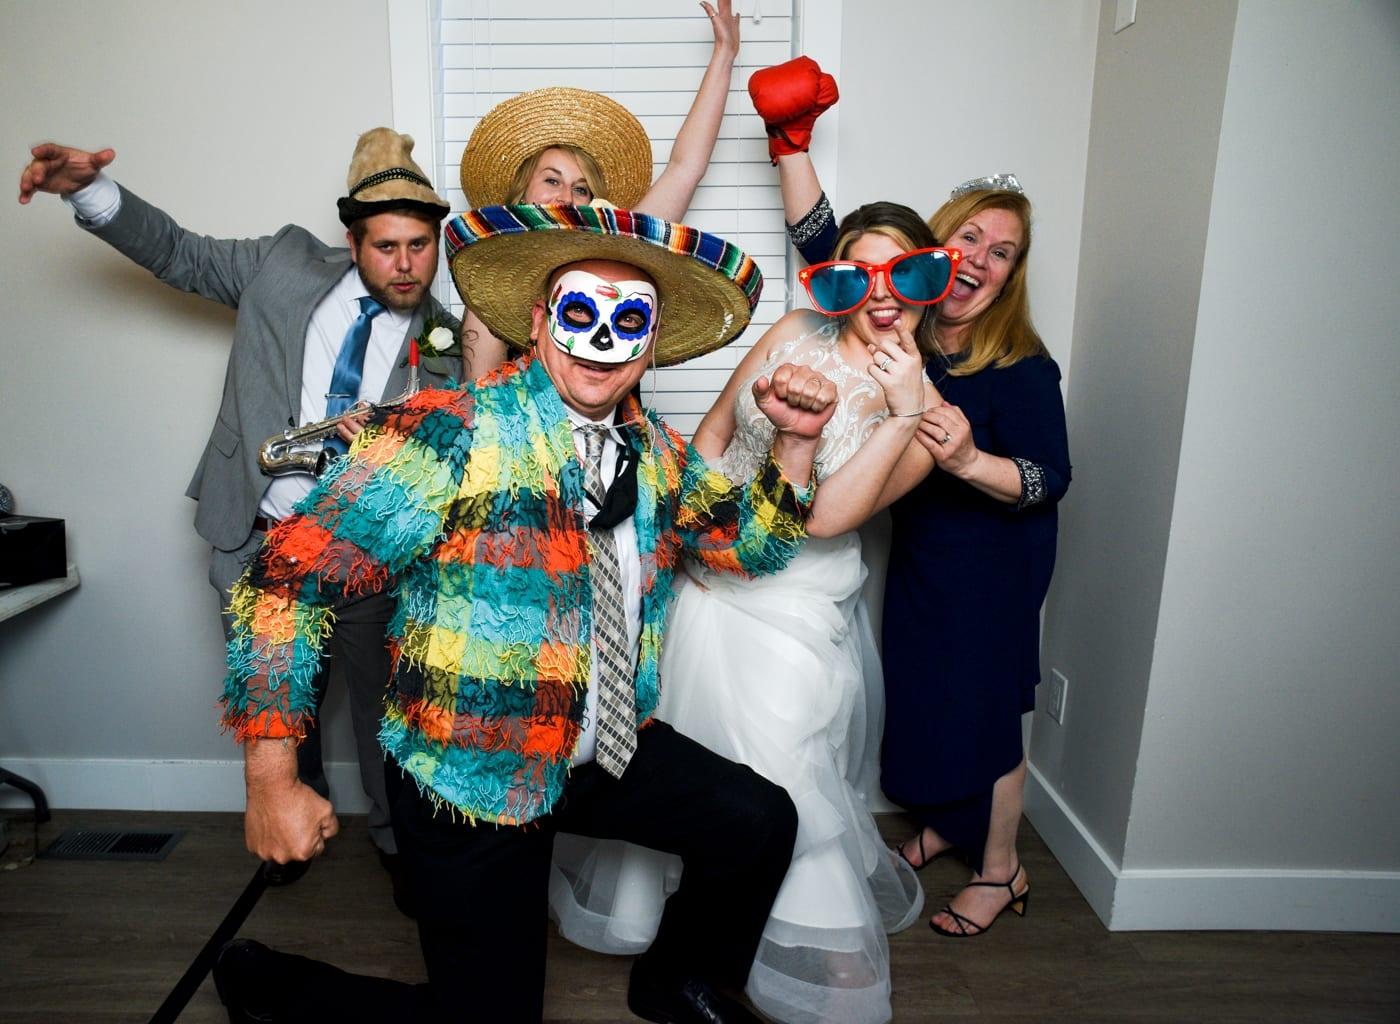 Photo-Booth-Wedding-Reception-The-Lodge-at-Triple-Tree-Farm-Greener-Visuals